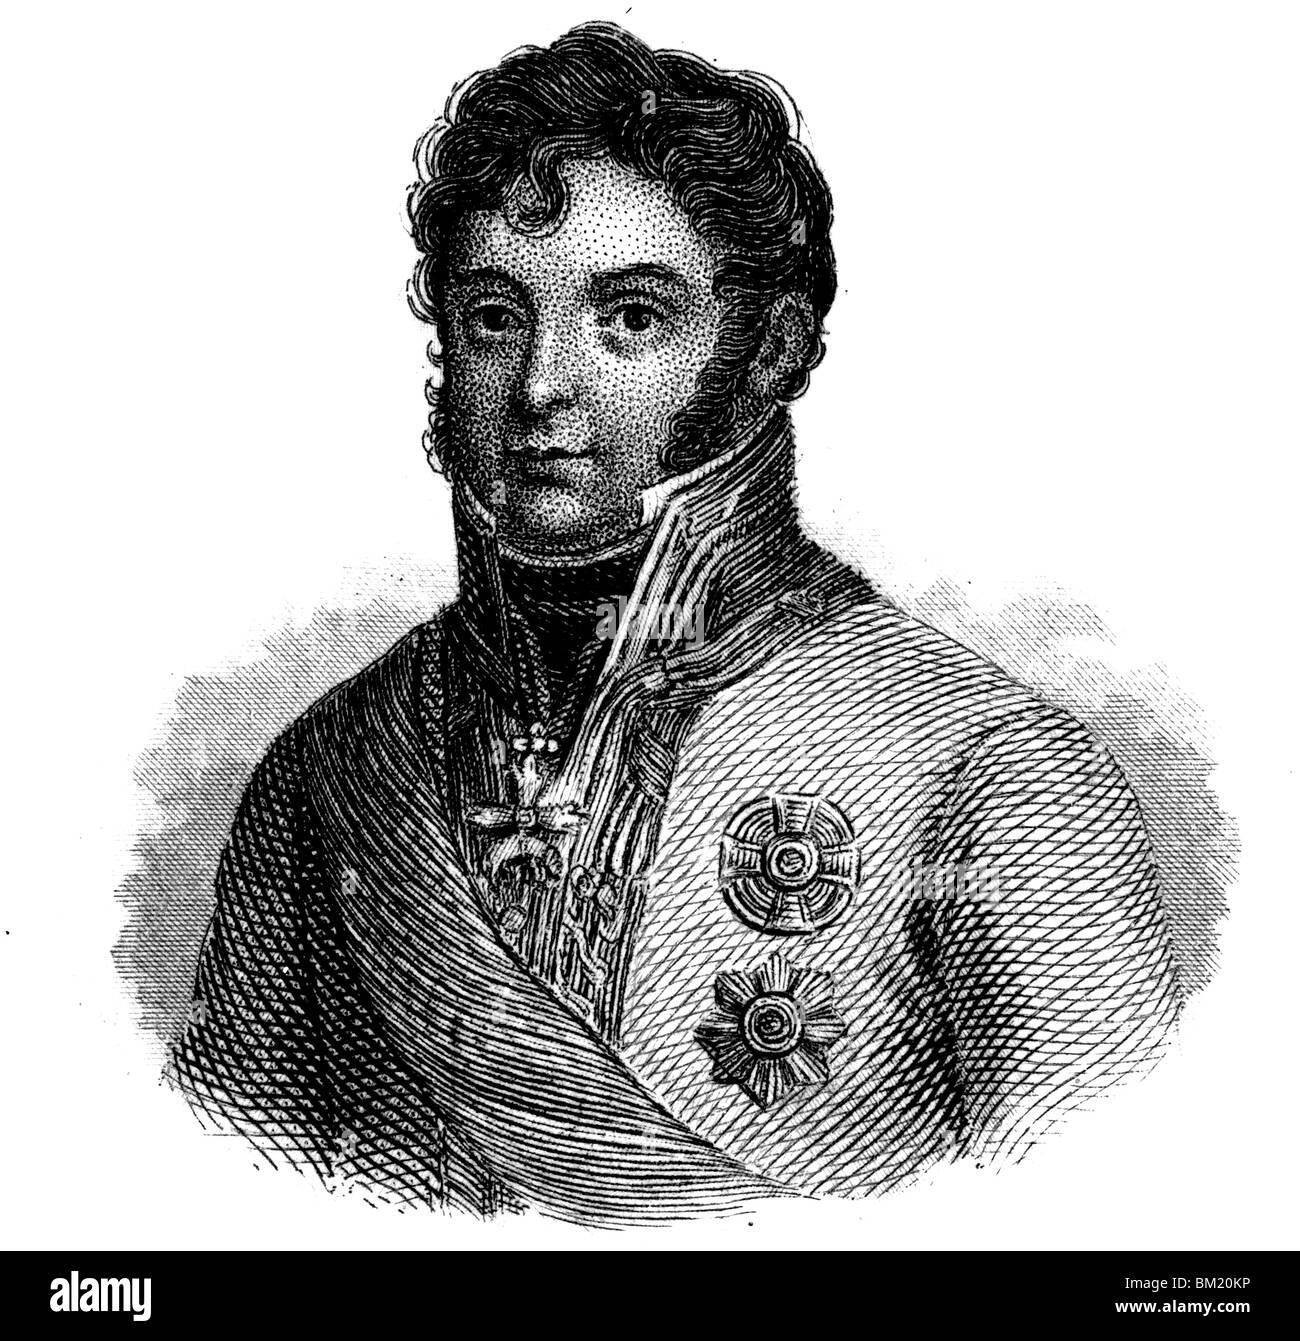 Karl Philipp, Prince of Schwarzenberg - Stock Image